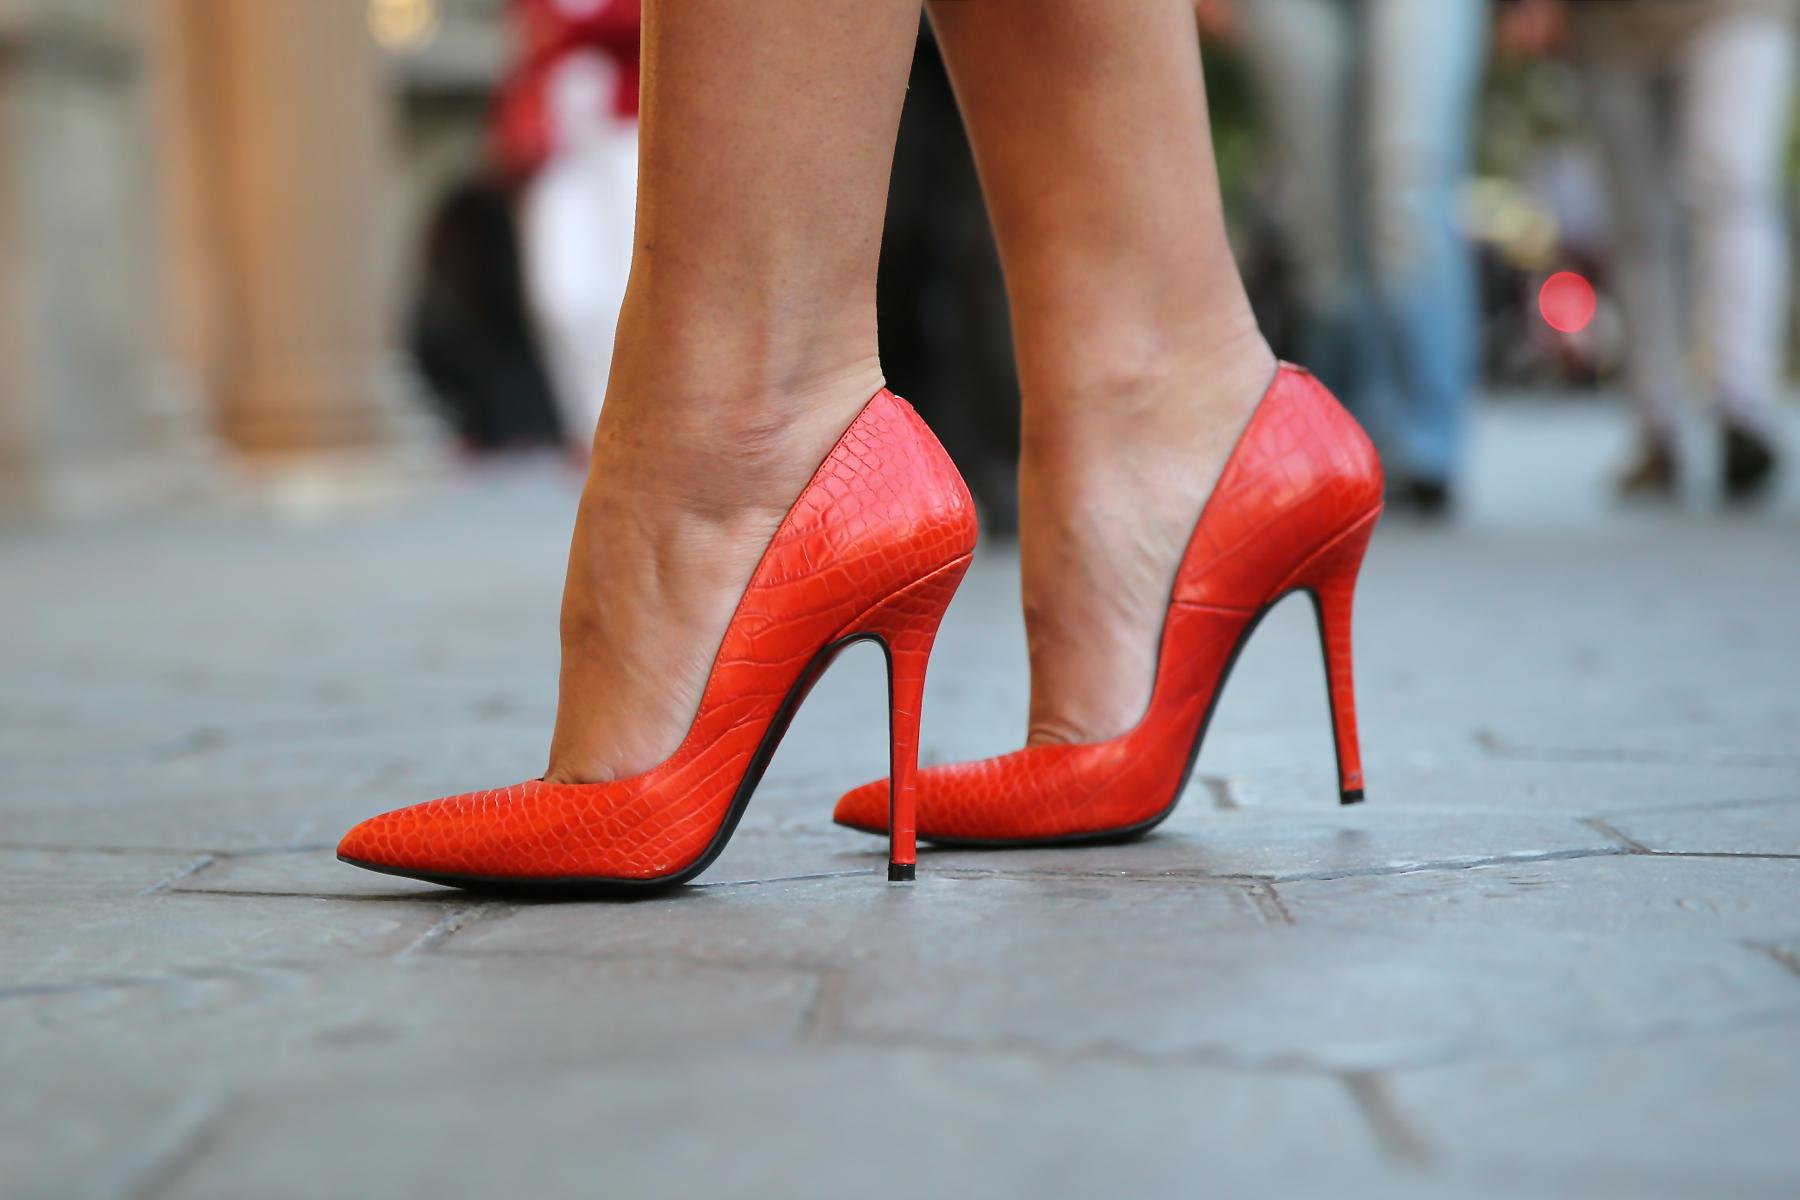 trendy_taste-look-outfit-hotel_majestic-street_style-ootd-blog-blogger-fashion_spain-moda_españa-falda_flecos-fringes_skirt-mas34-mango-blusa_flores-primaver_verano-zapatos_naranjas-tocado_dorado-1